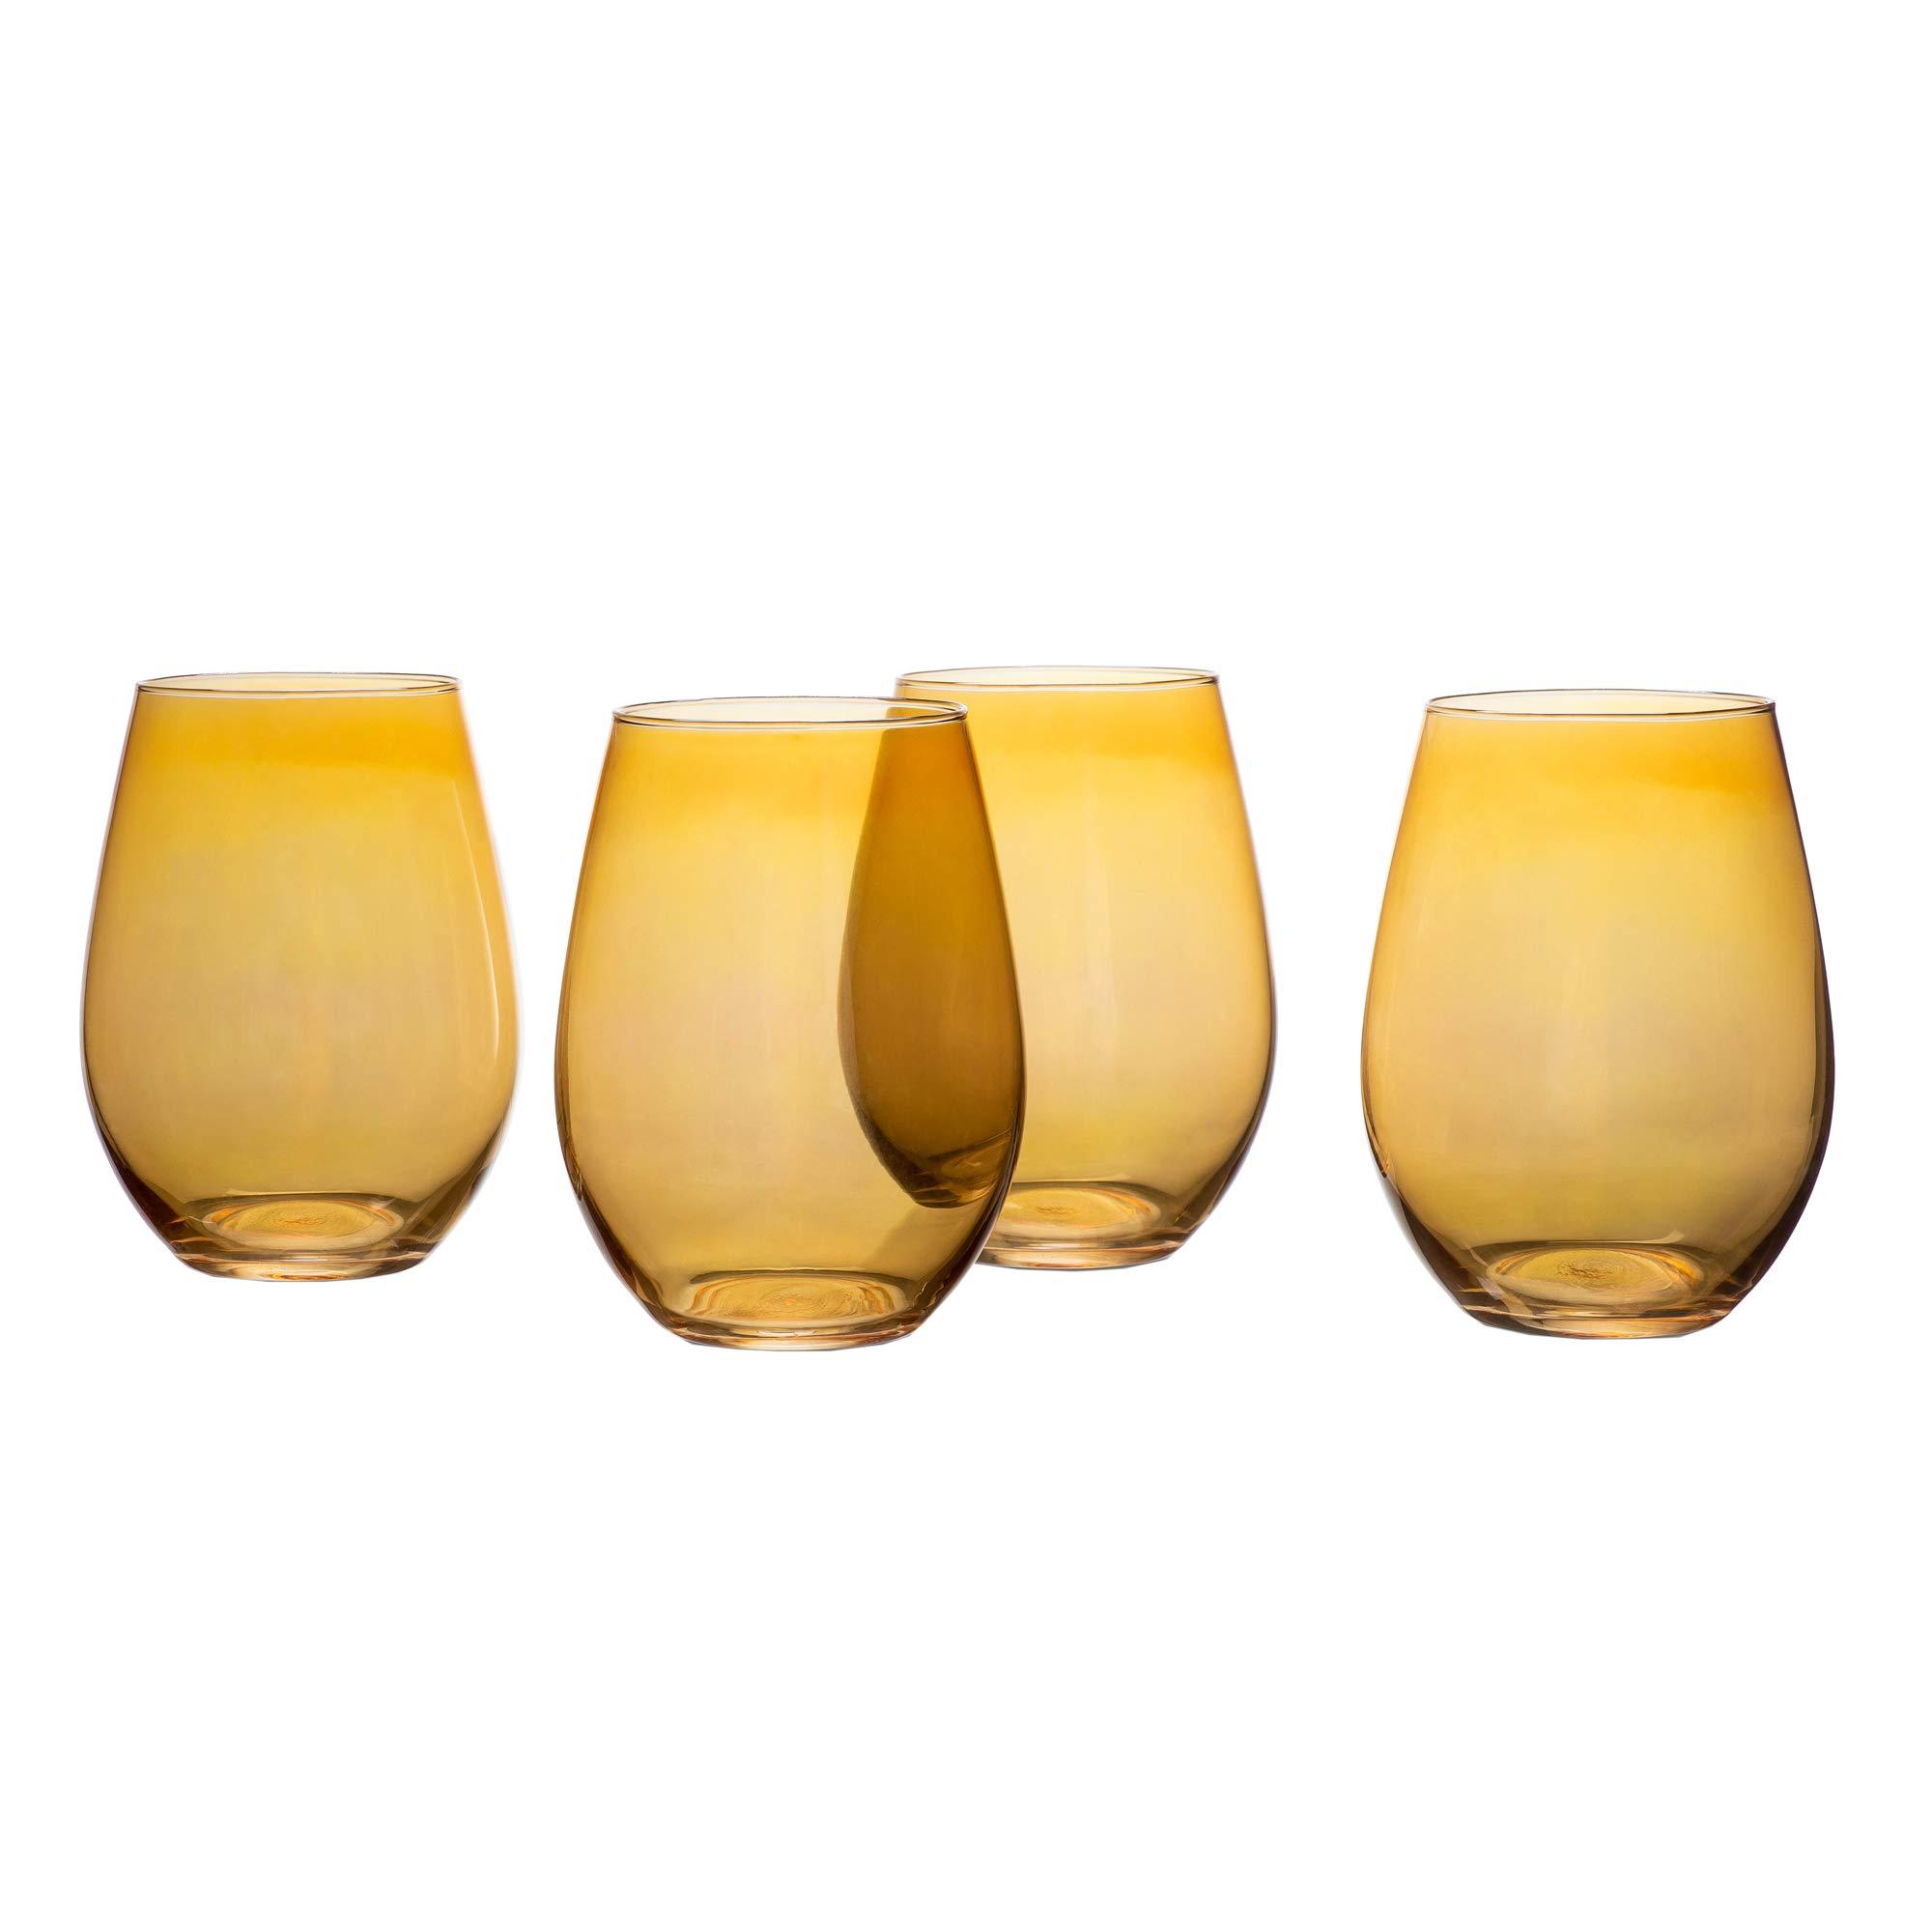 Elle Décor 329173-4ST Luster Set of 4 Stemless Wine Goblets, 19 Ounces, Amber